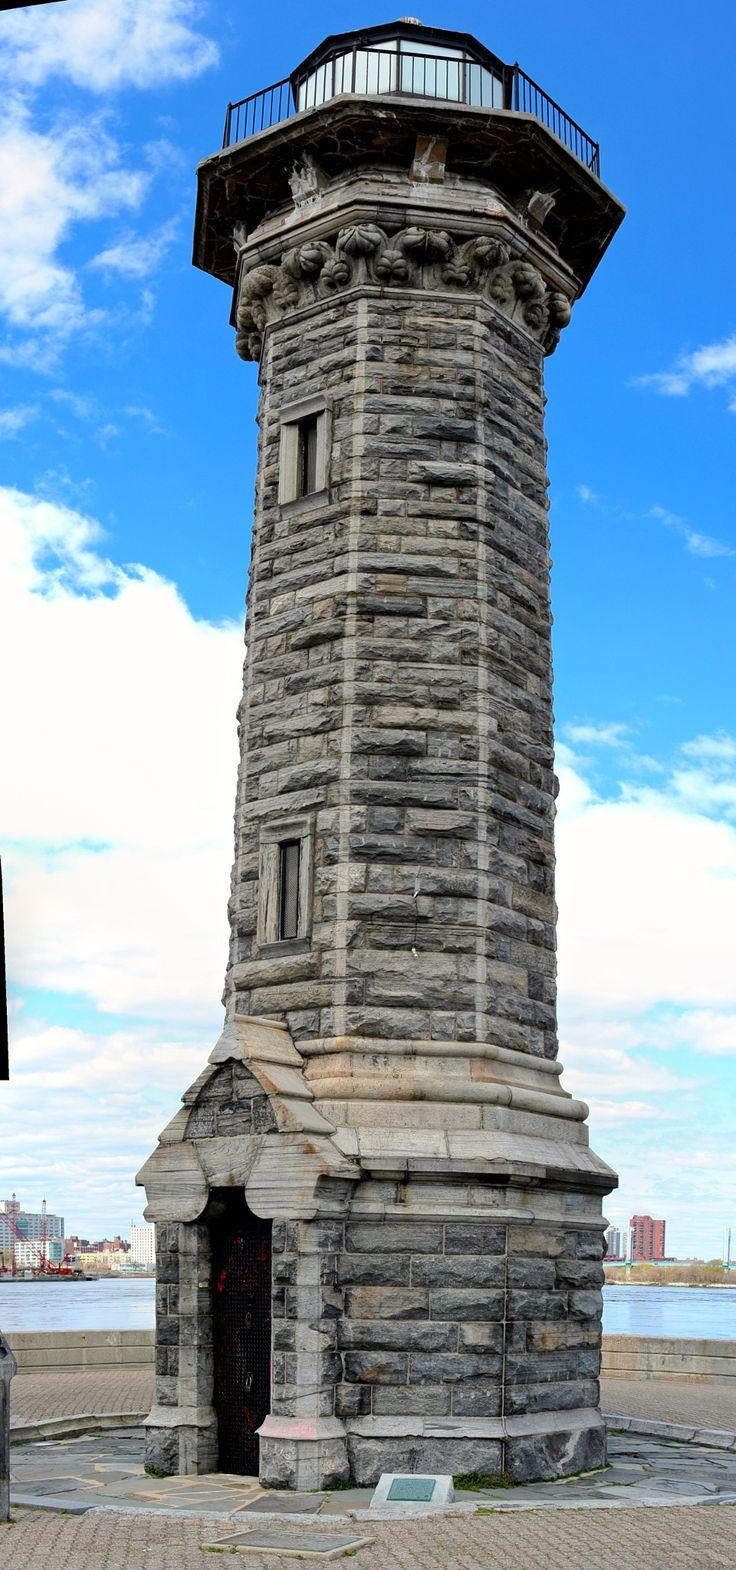 Roosevelt Island Lighthouse - 1872